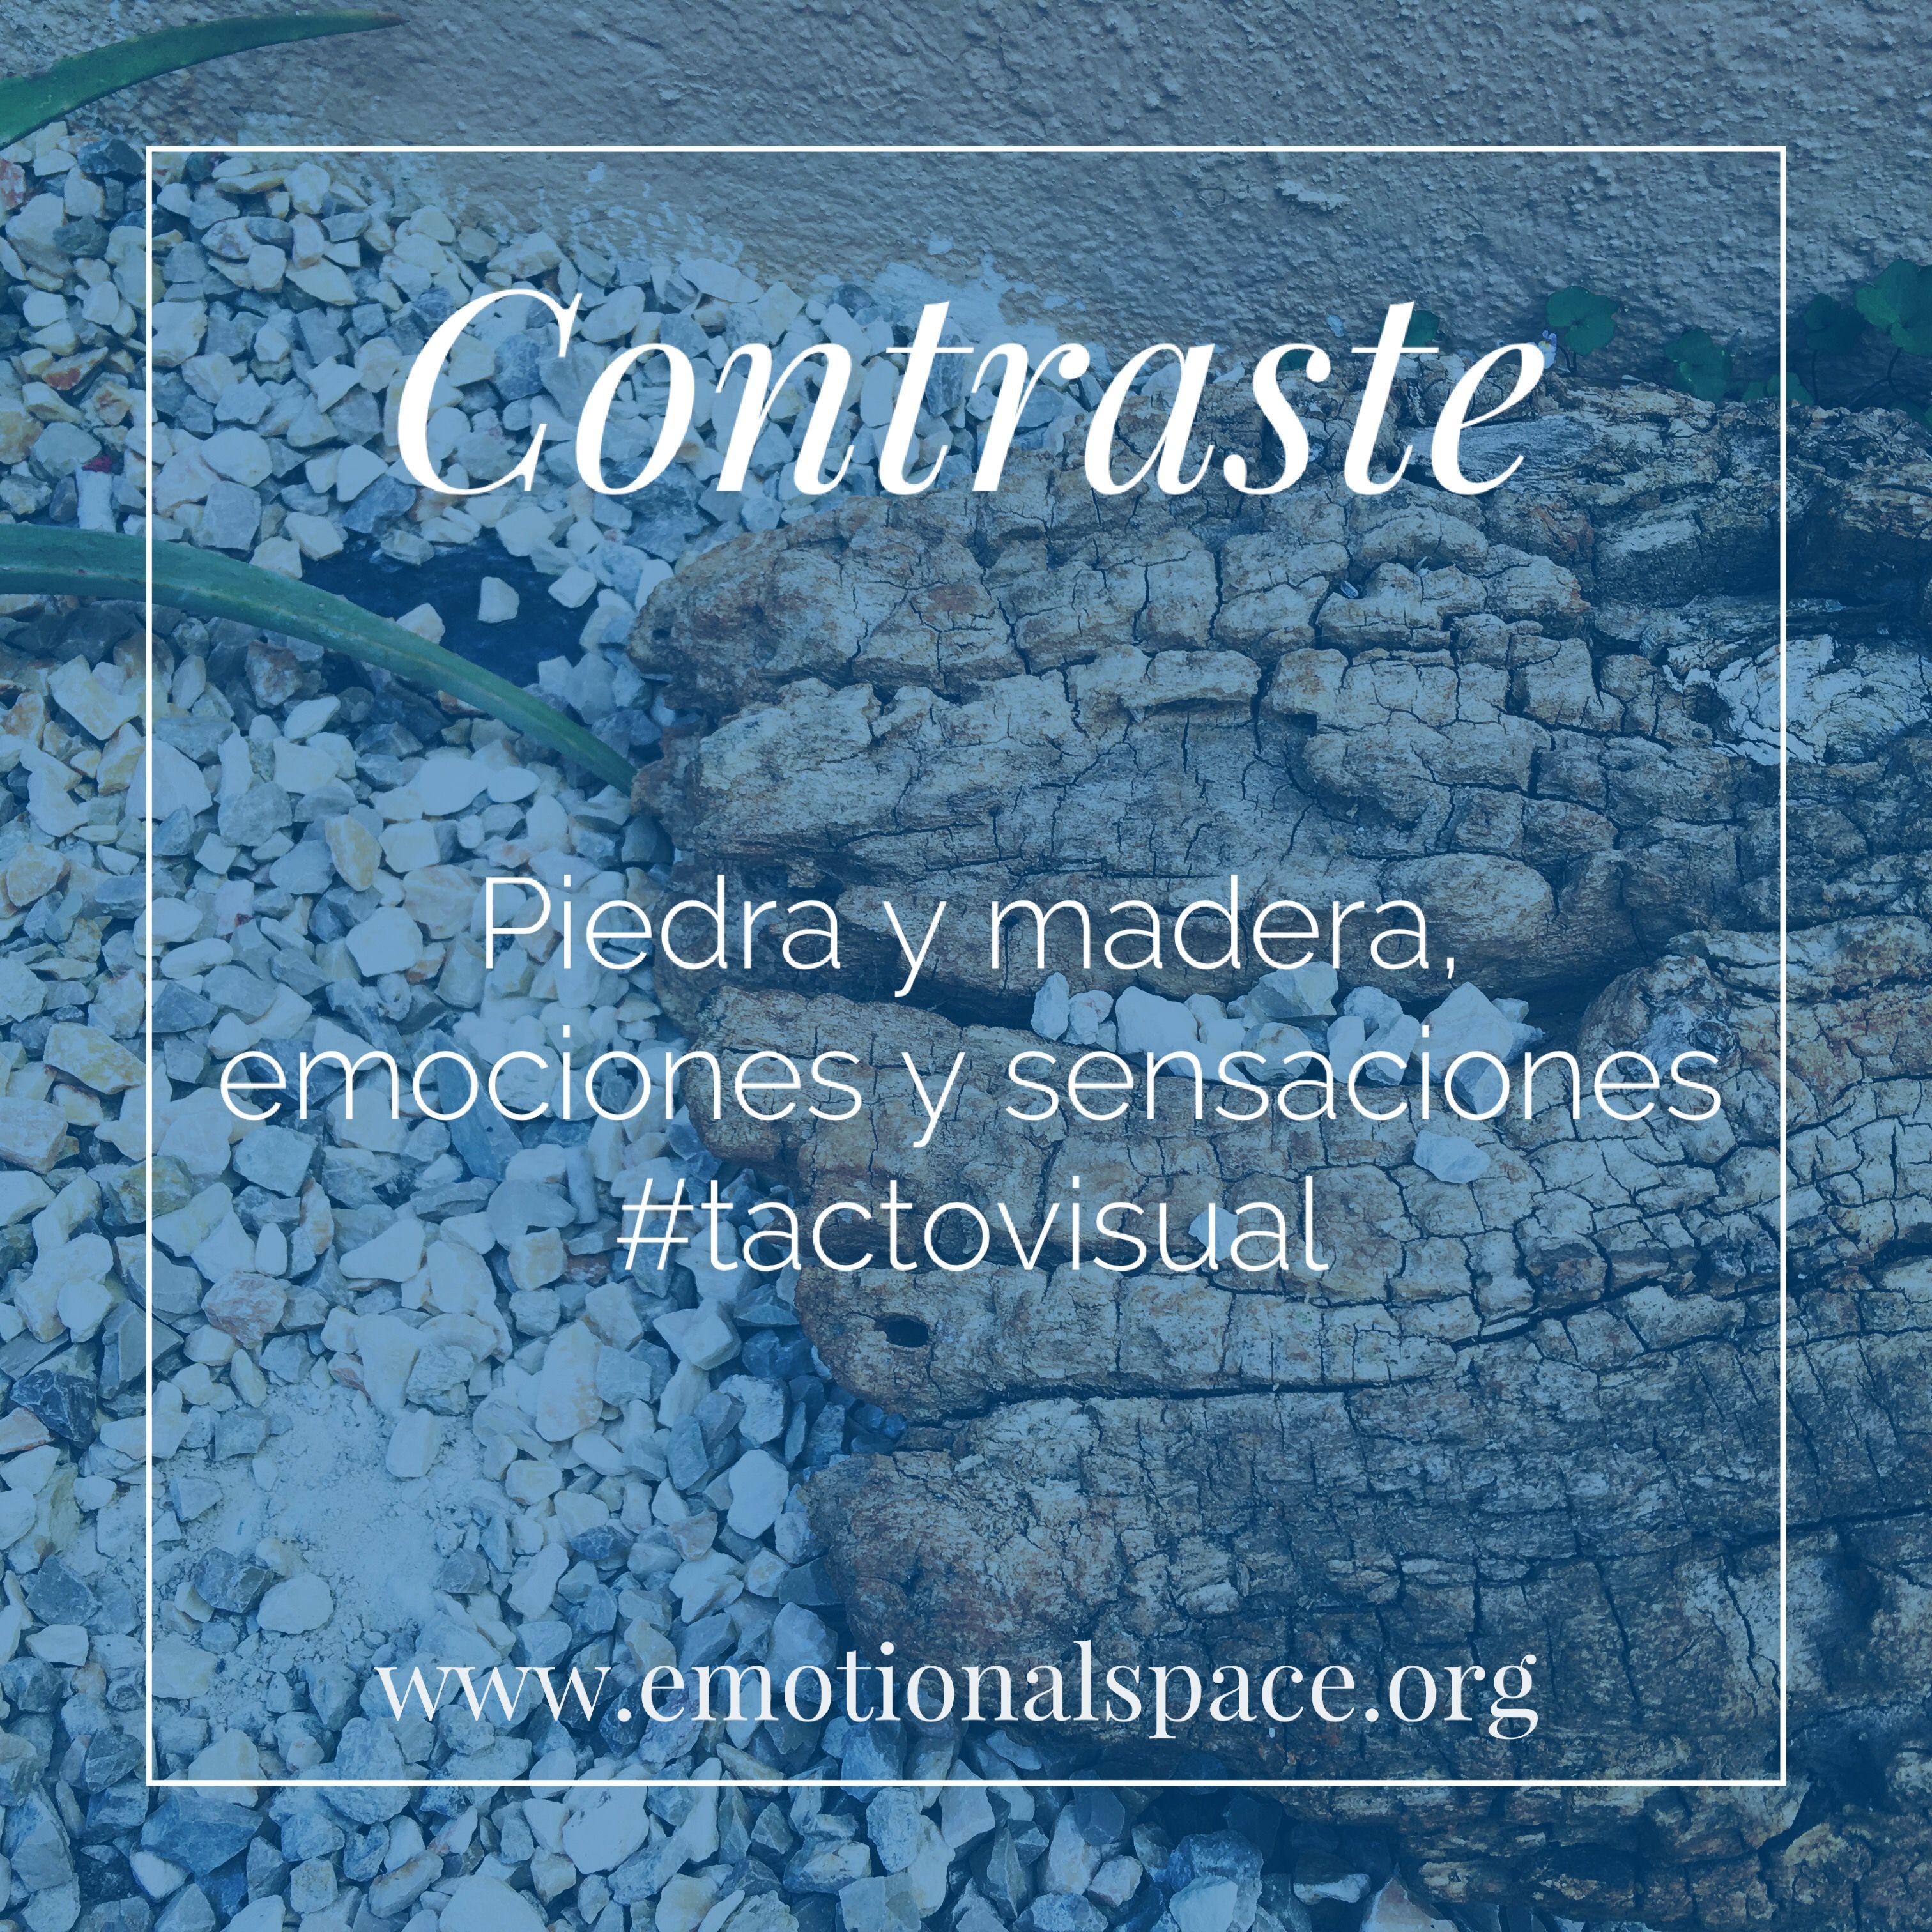 #tactovisual